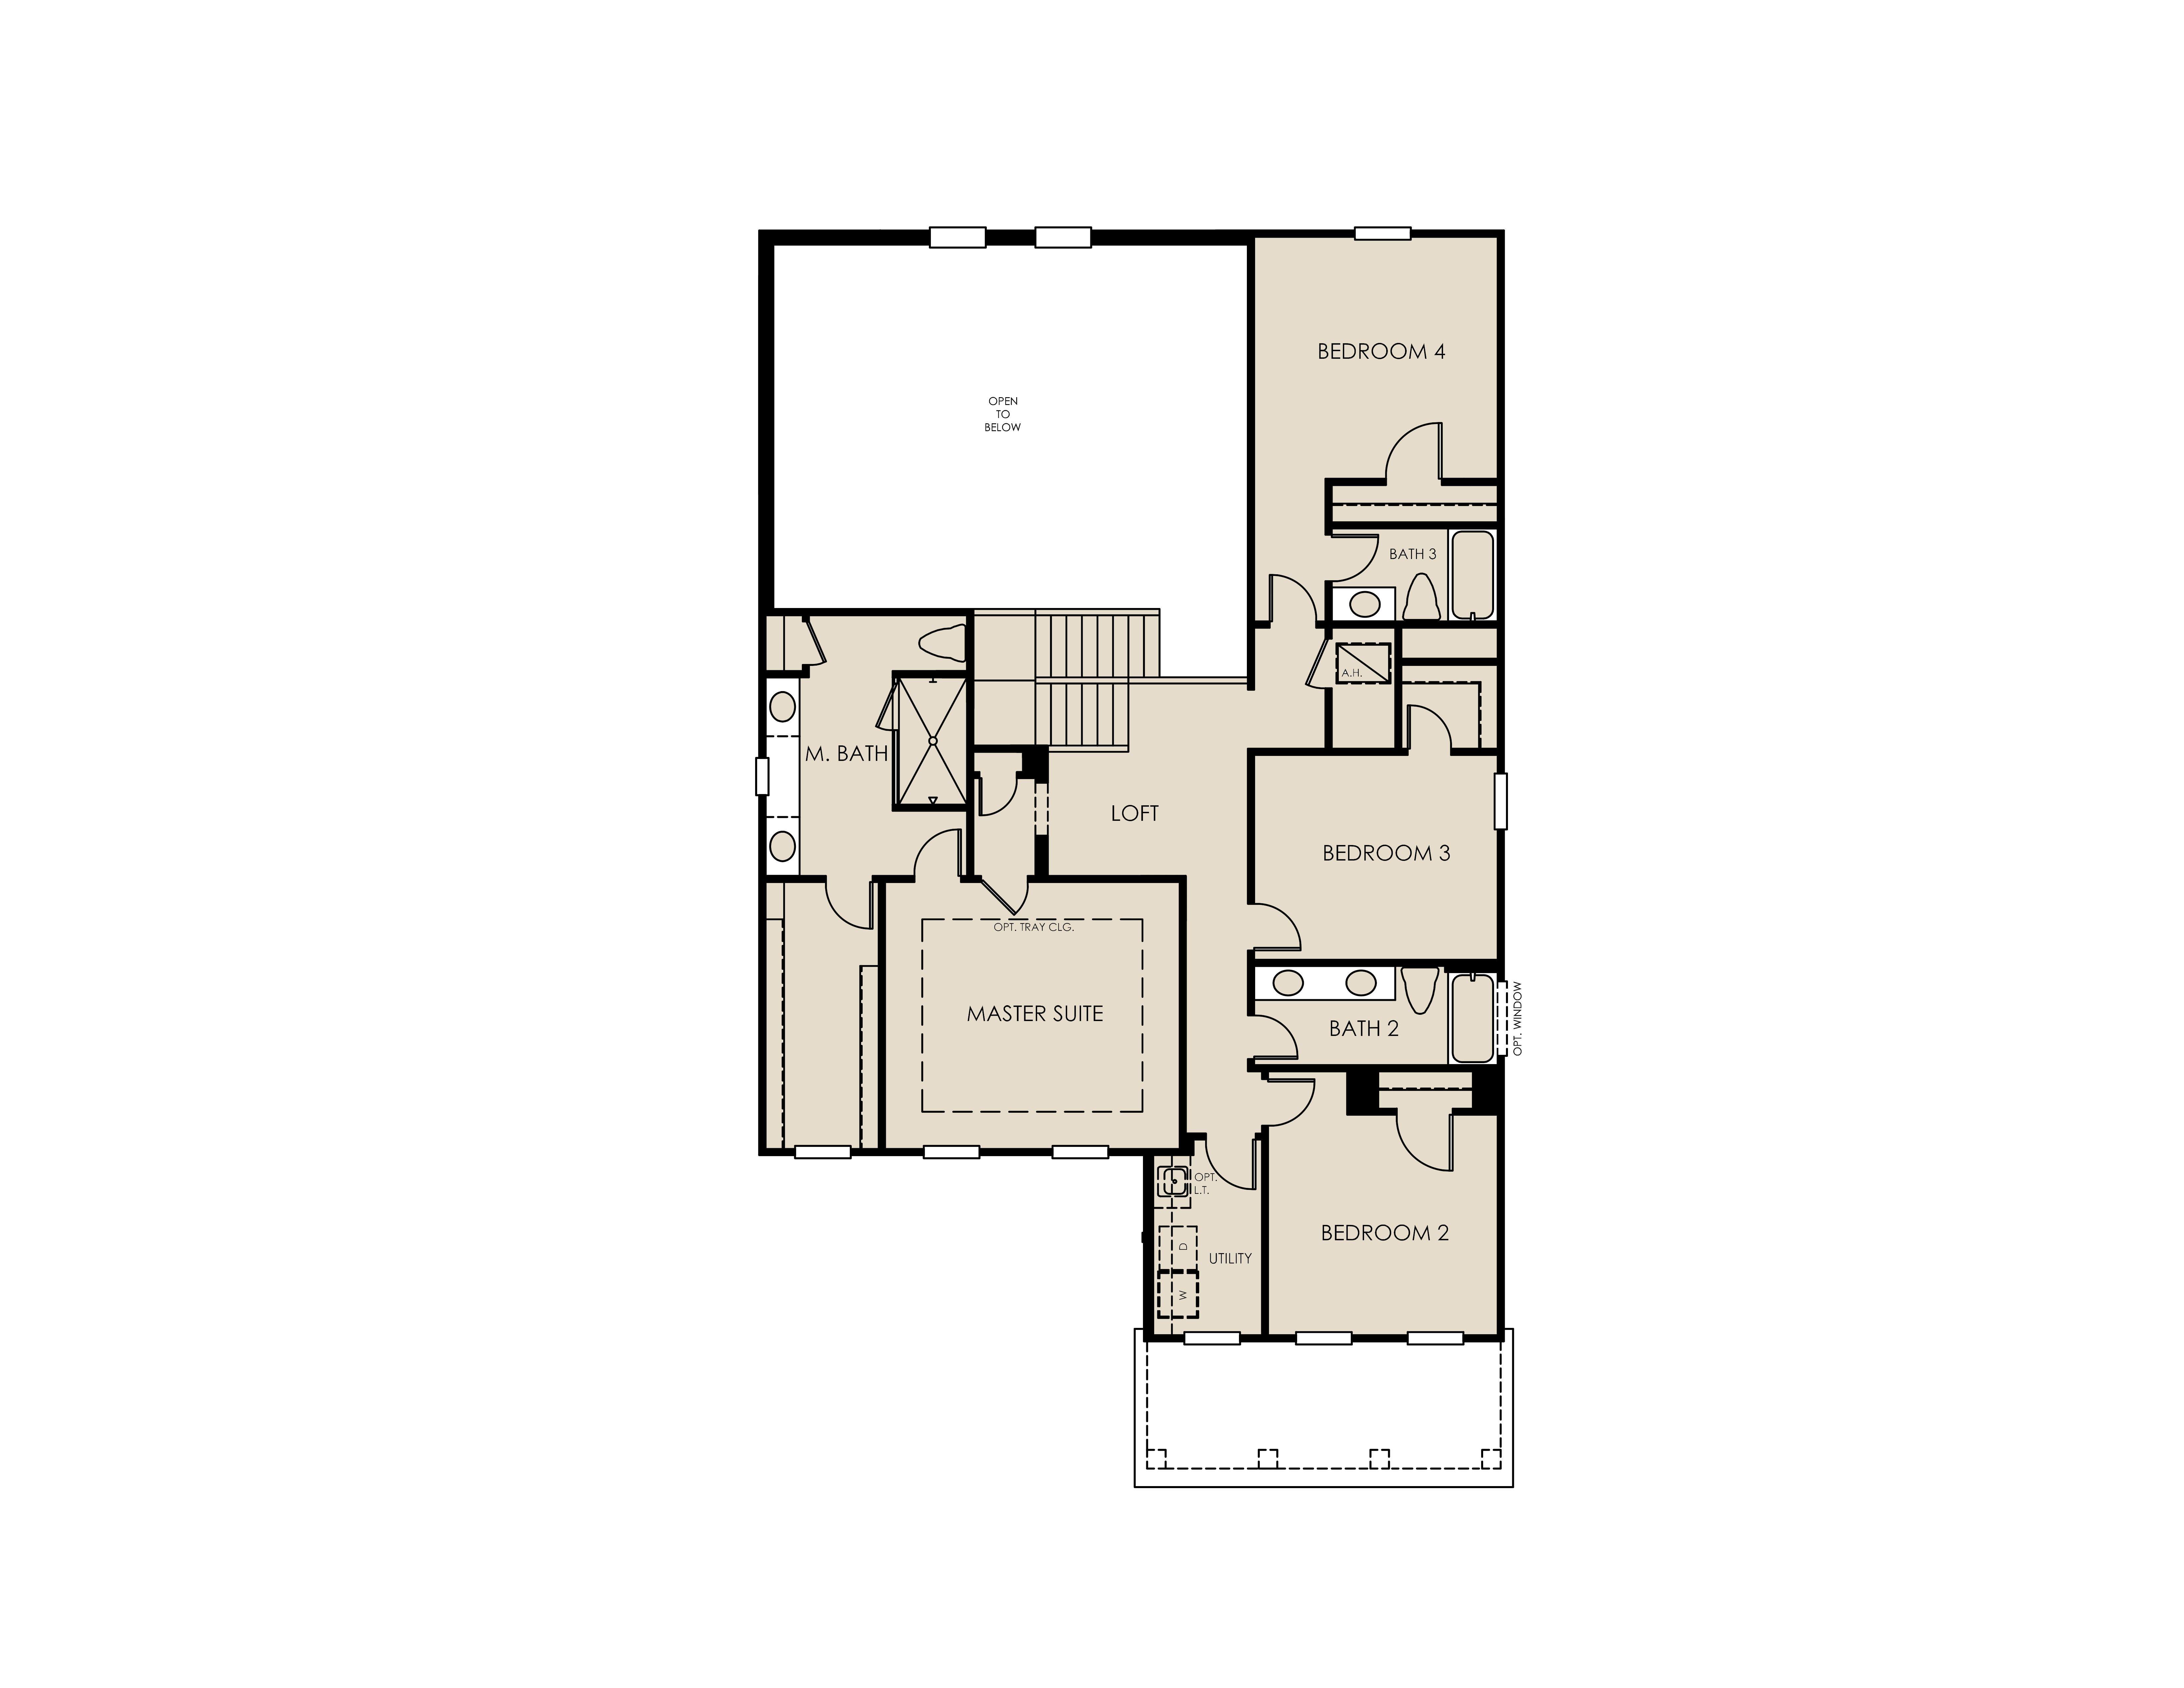 Ashton Woods Homes, Latham Park, Griffin-1400976, Winter Garden ...